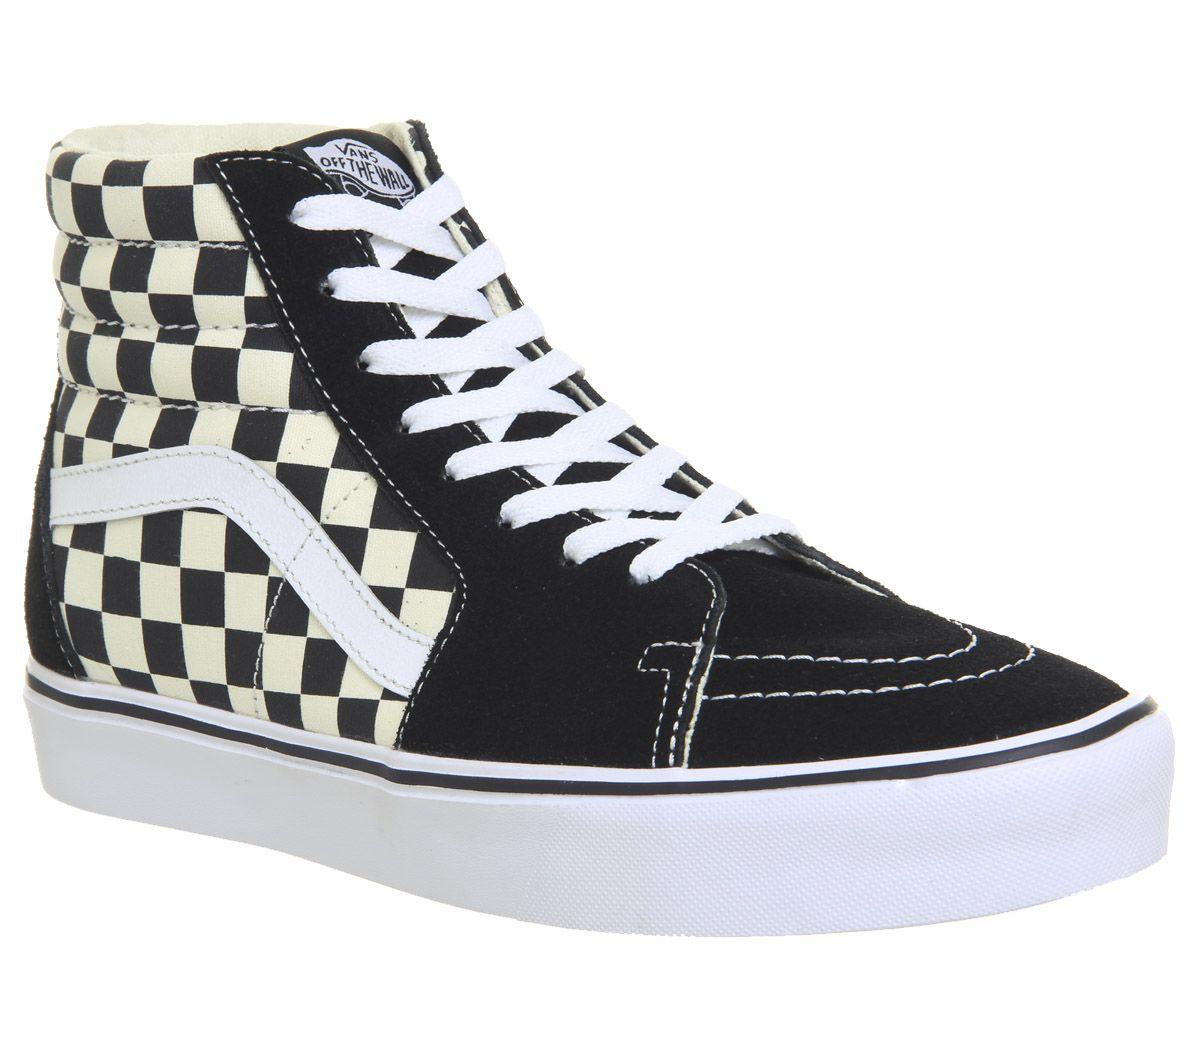 45d6f0d98219ee Vans Sk8 Hi Lite Black White Checkerboard - His trainers